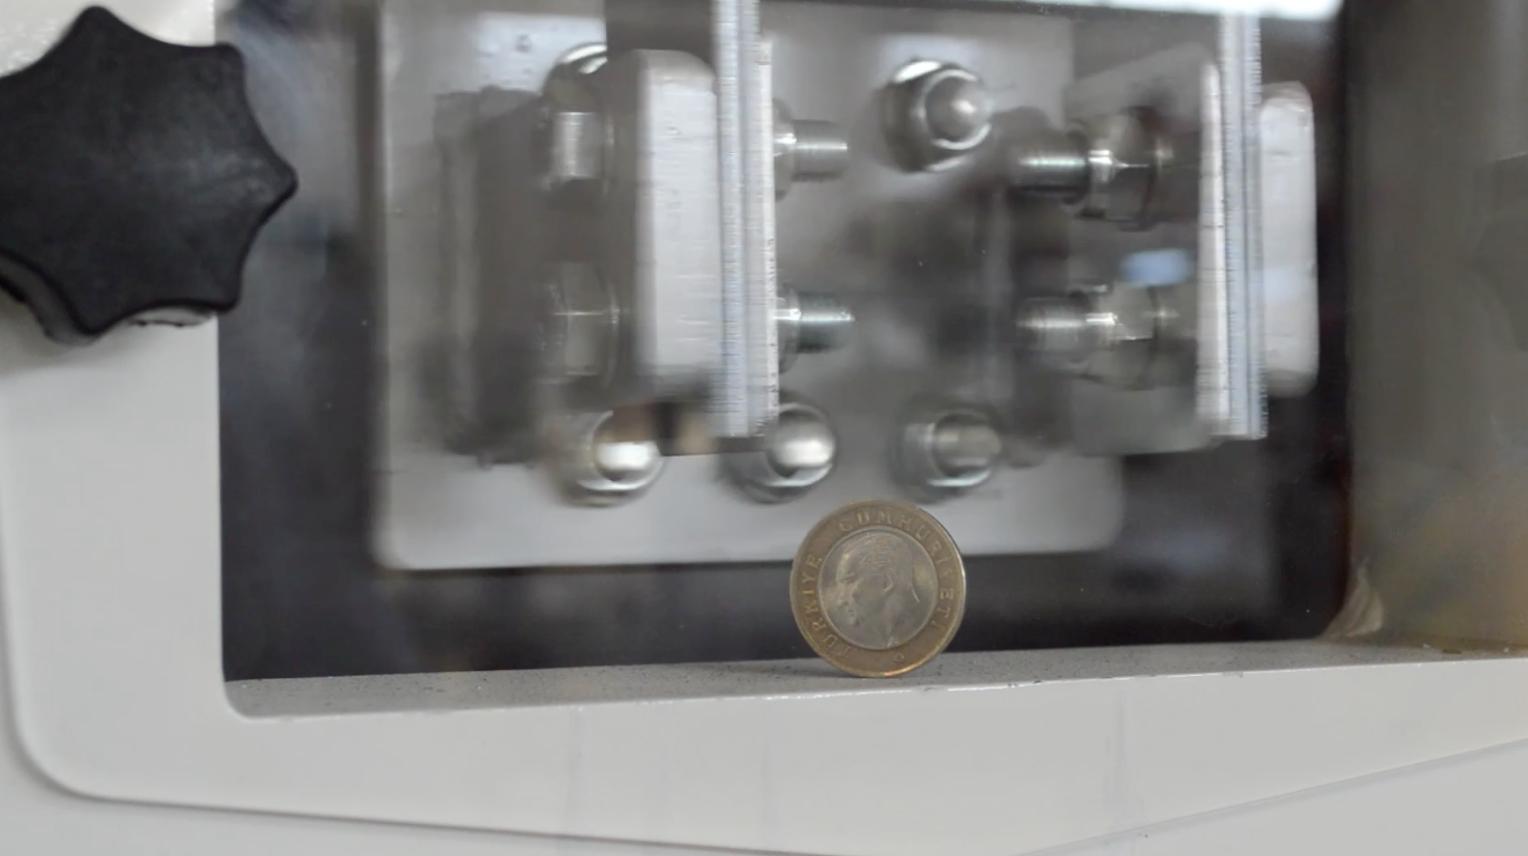 Aky Technology'nin Eleme Makineleri Madeni Para Testini Geçti